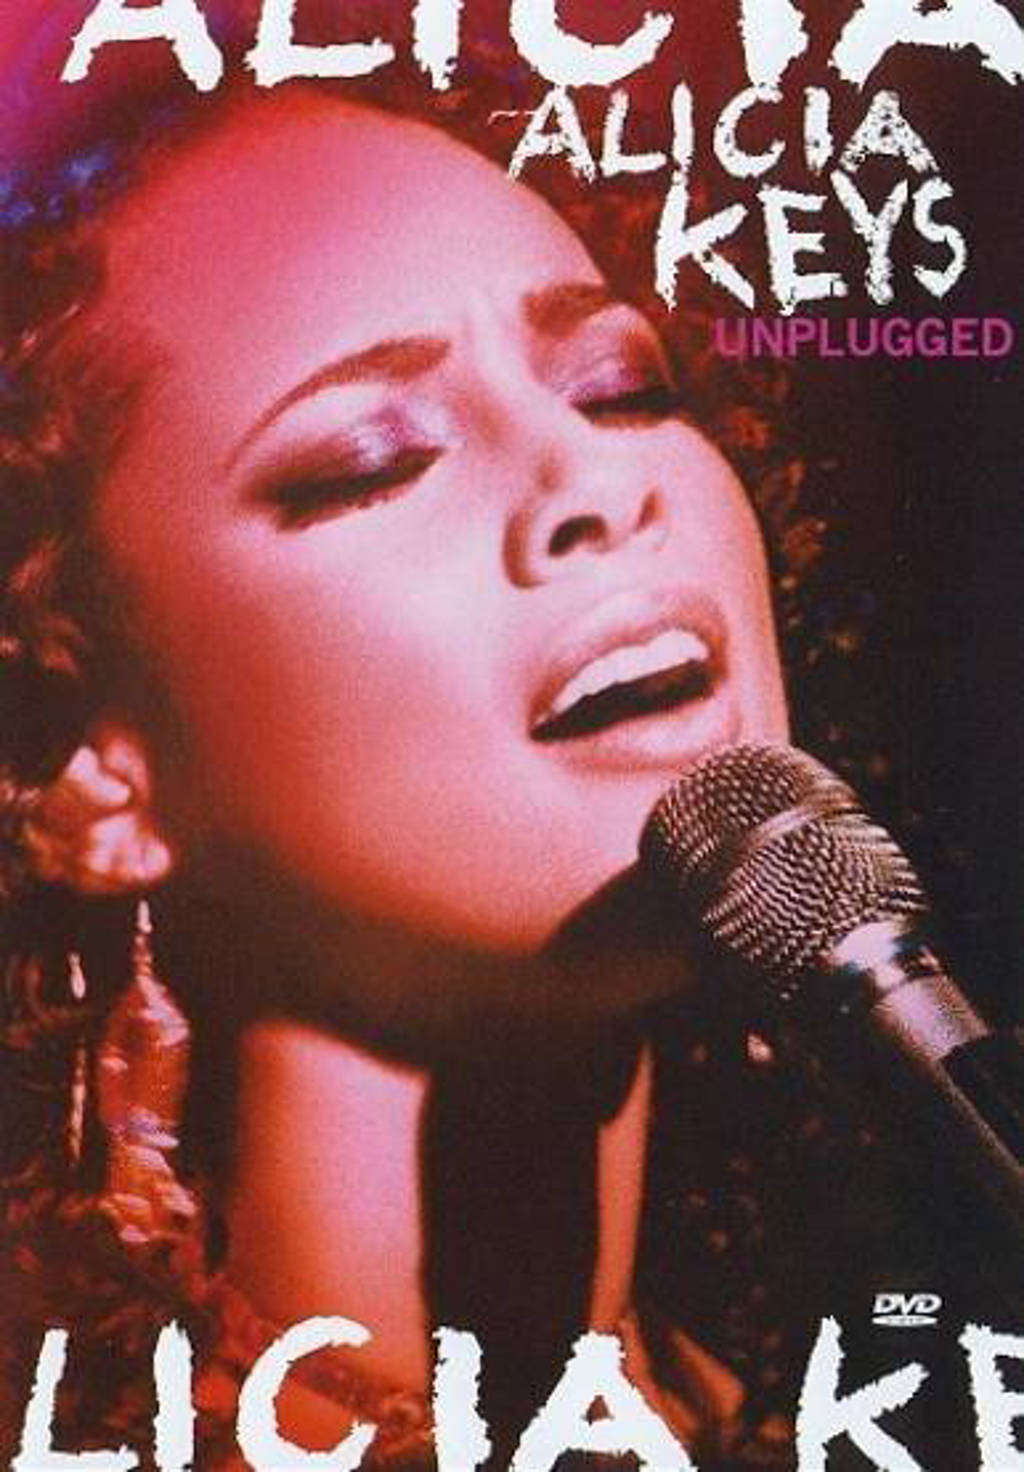 Alicia keys - mtv unplugged (DVD)